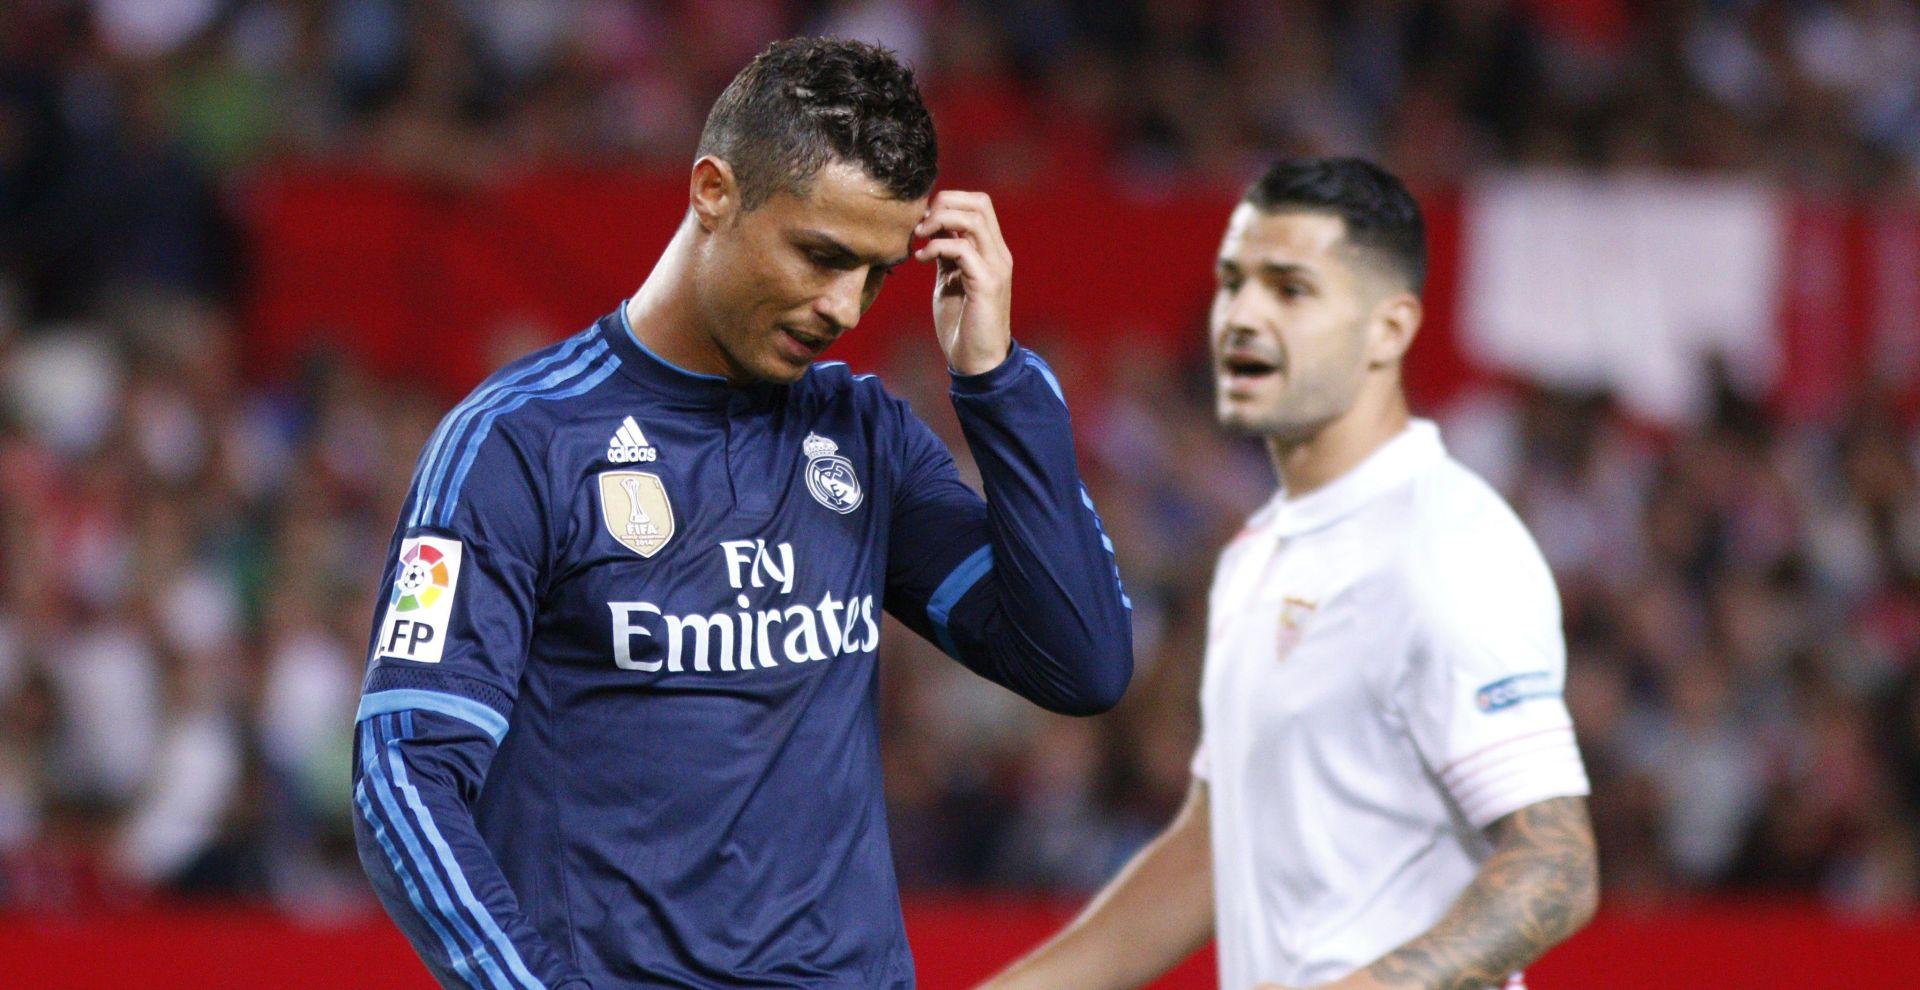 SPREMAN NA ODLAZAK IZ MADRIDA? Van Gaal: Želim Ronalda opet na Old Traffordu